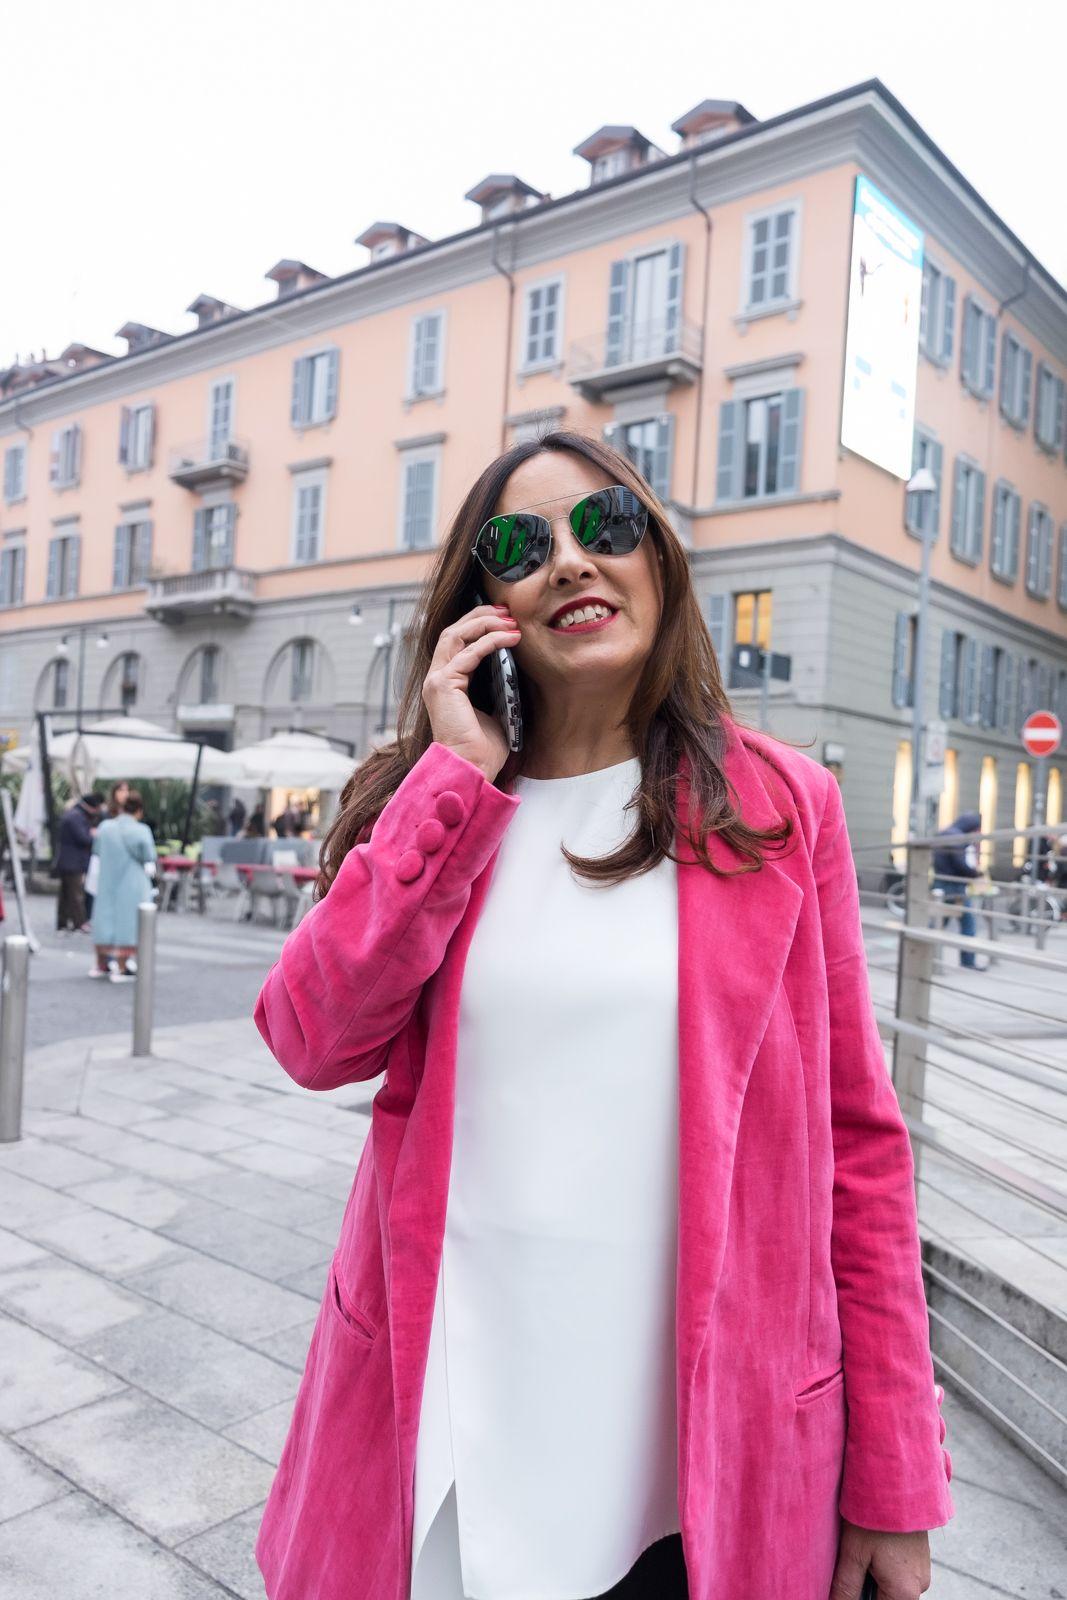 margiela sunglasses